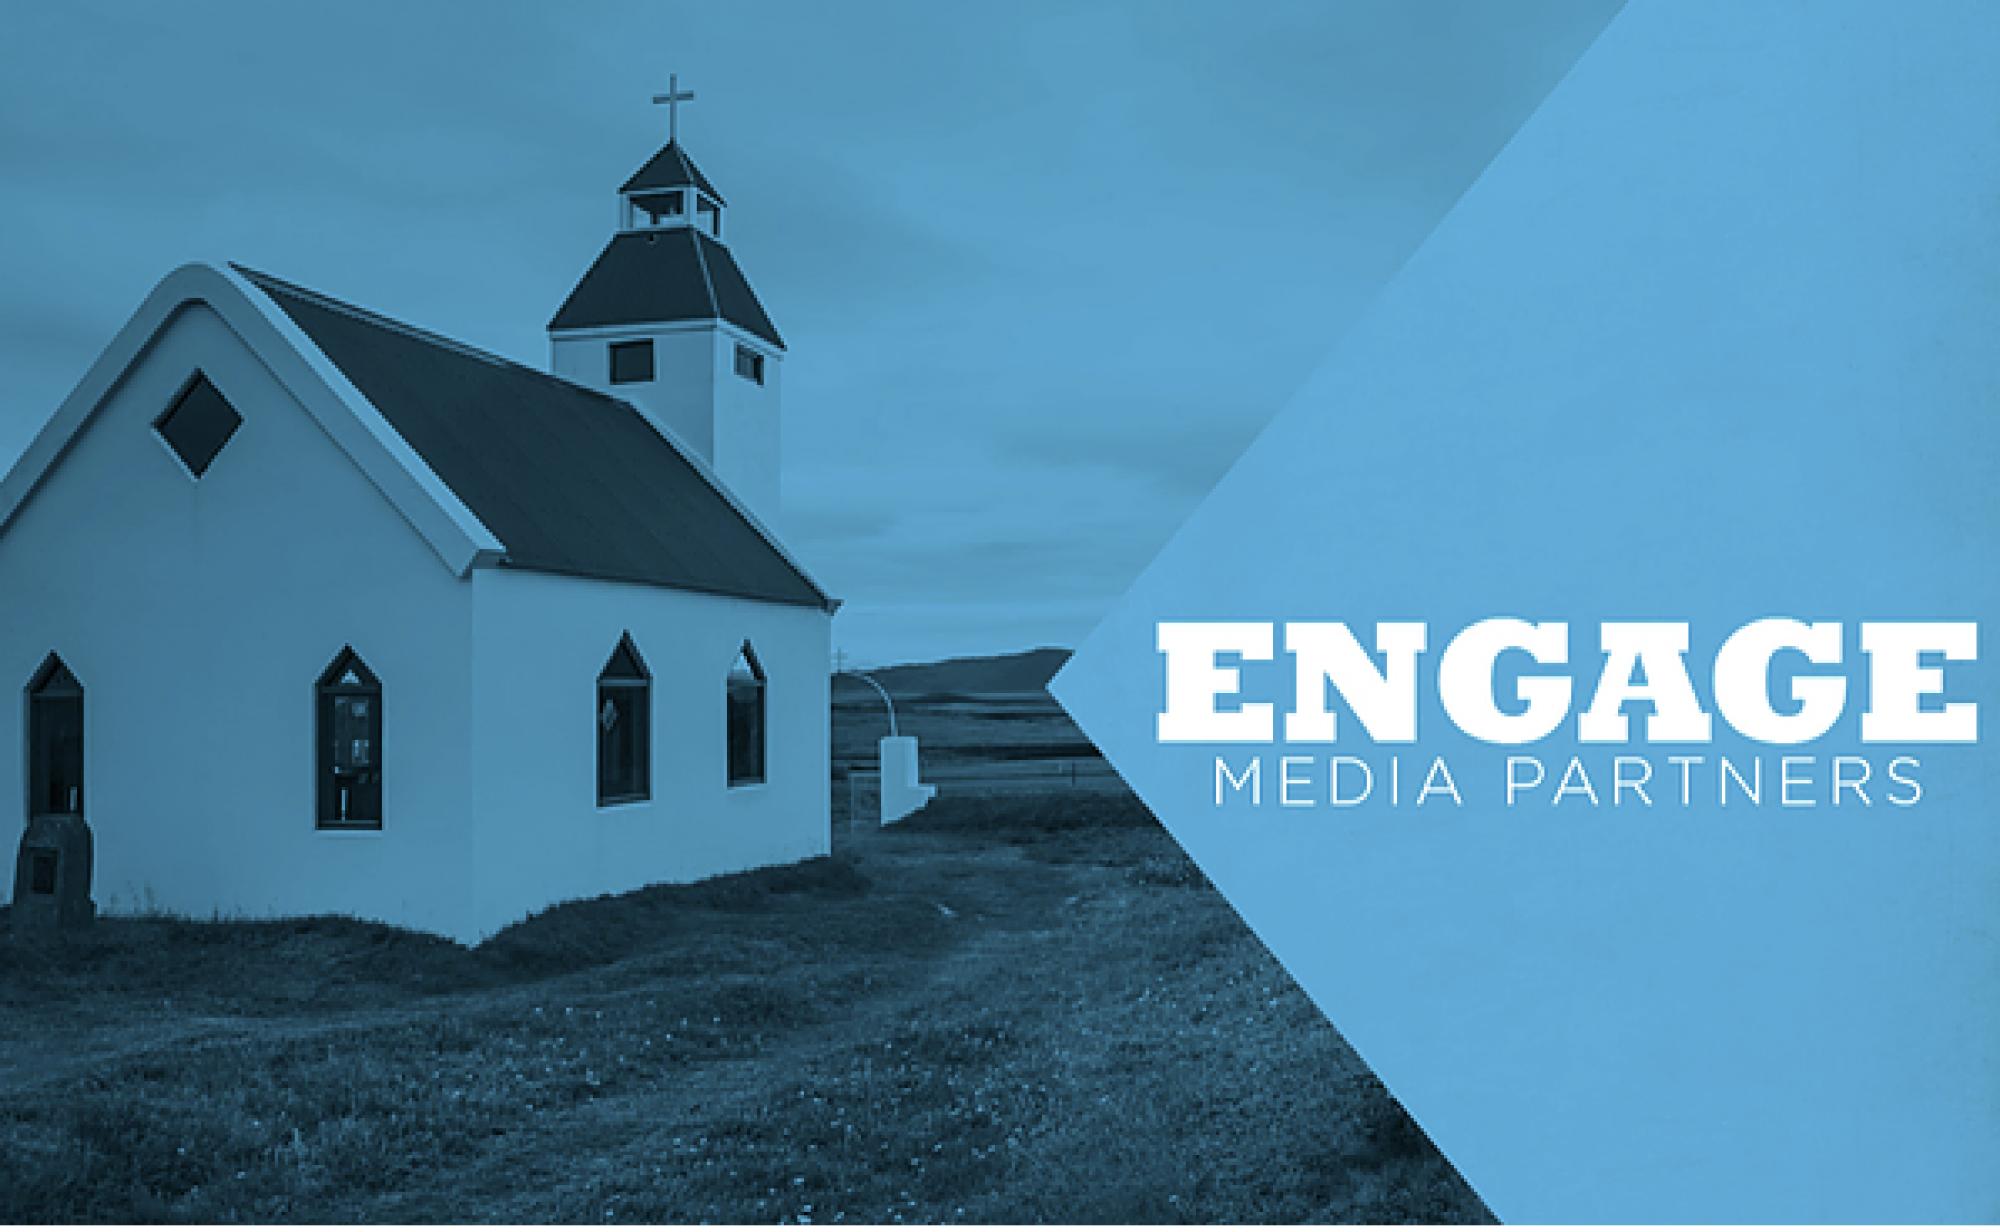 Engage Media Partners